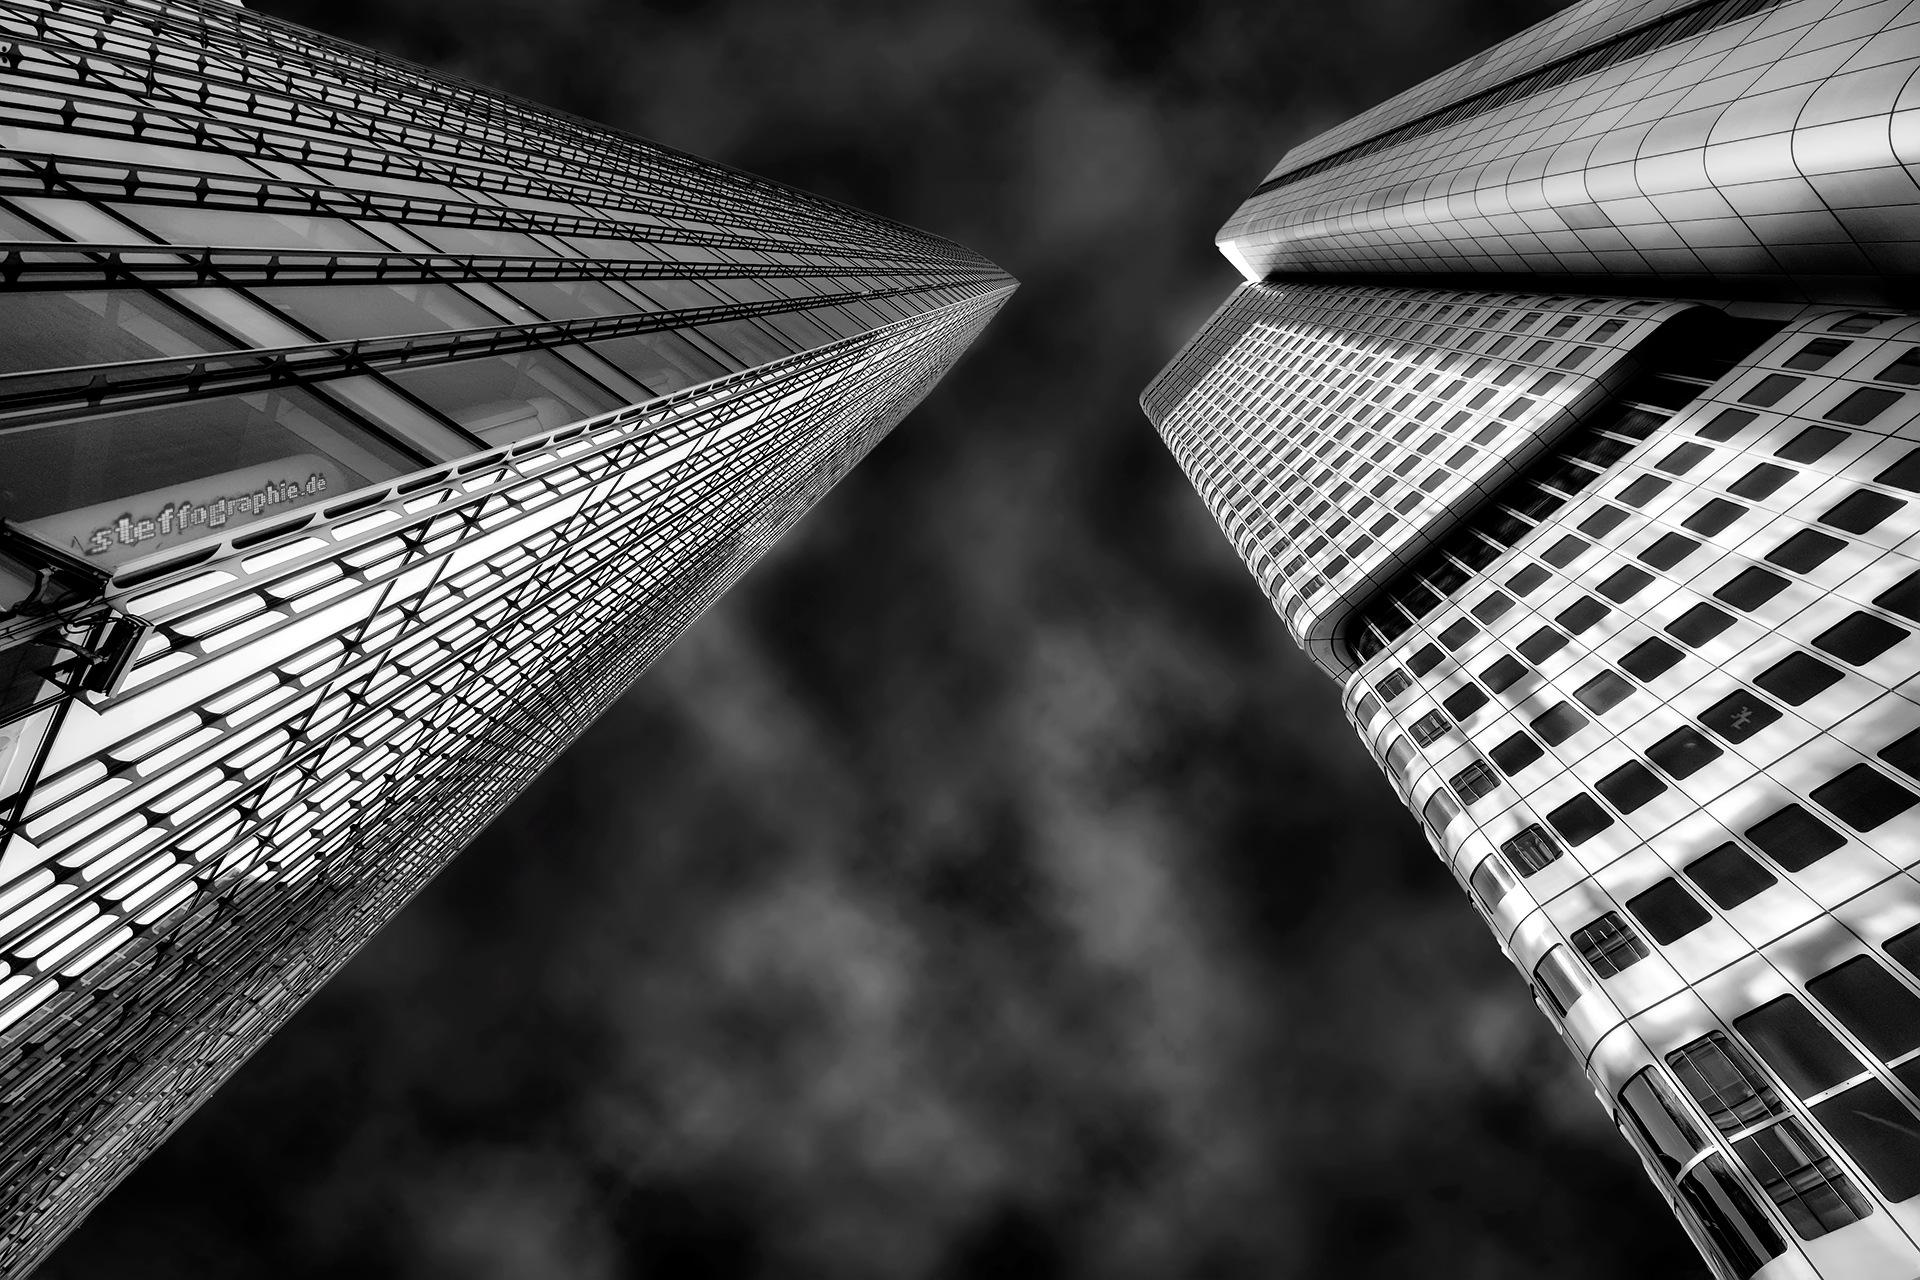 monochromscrapers  by steffographie